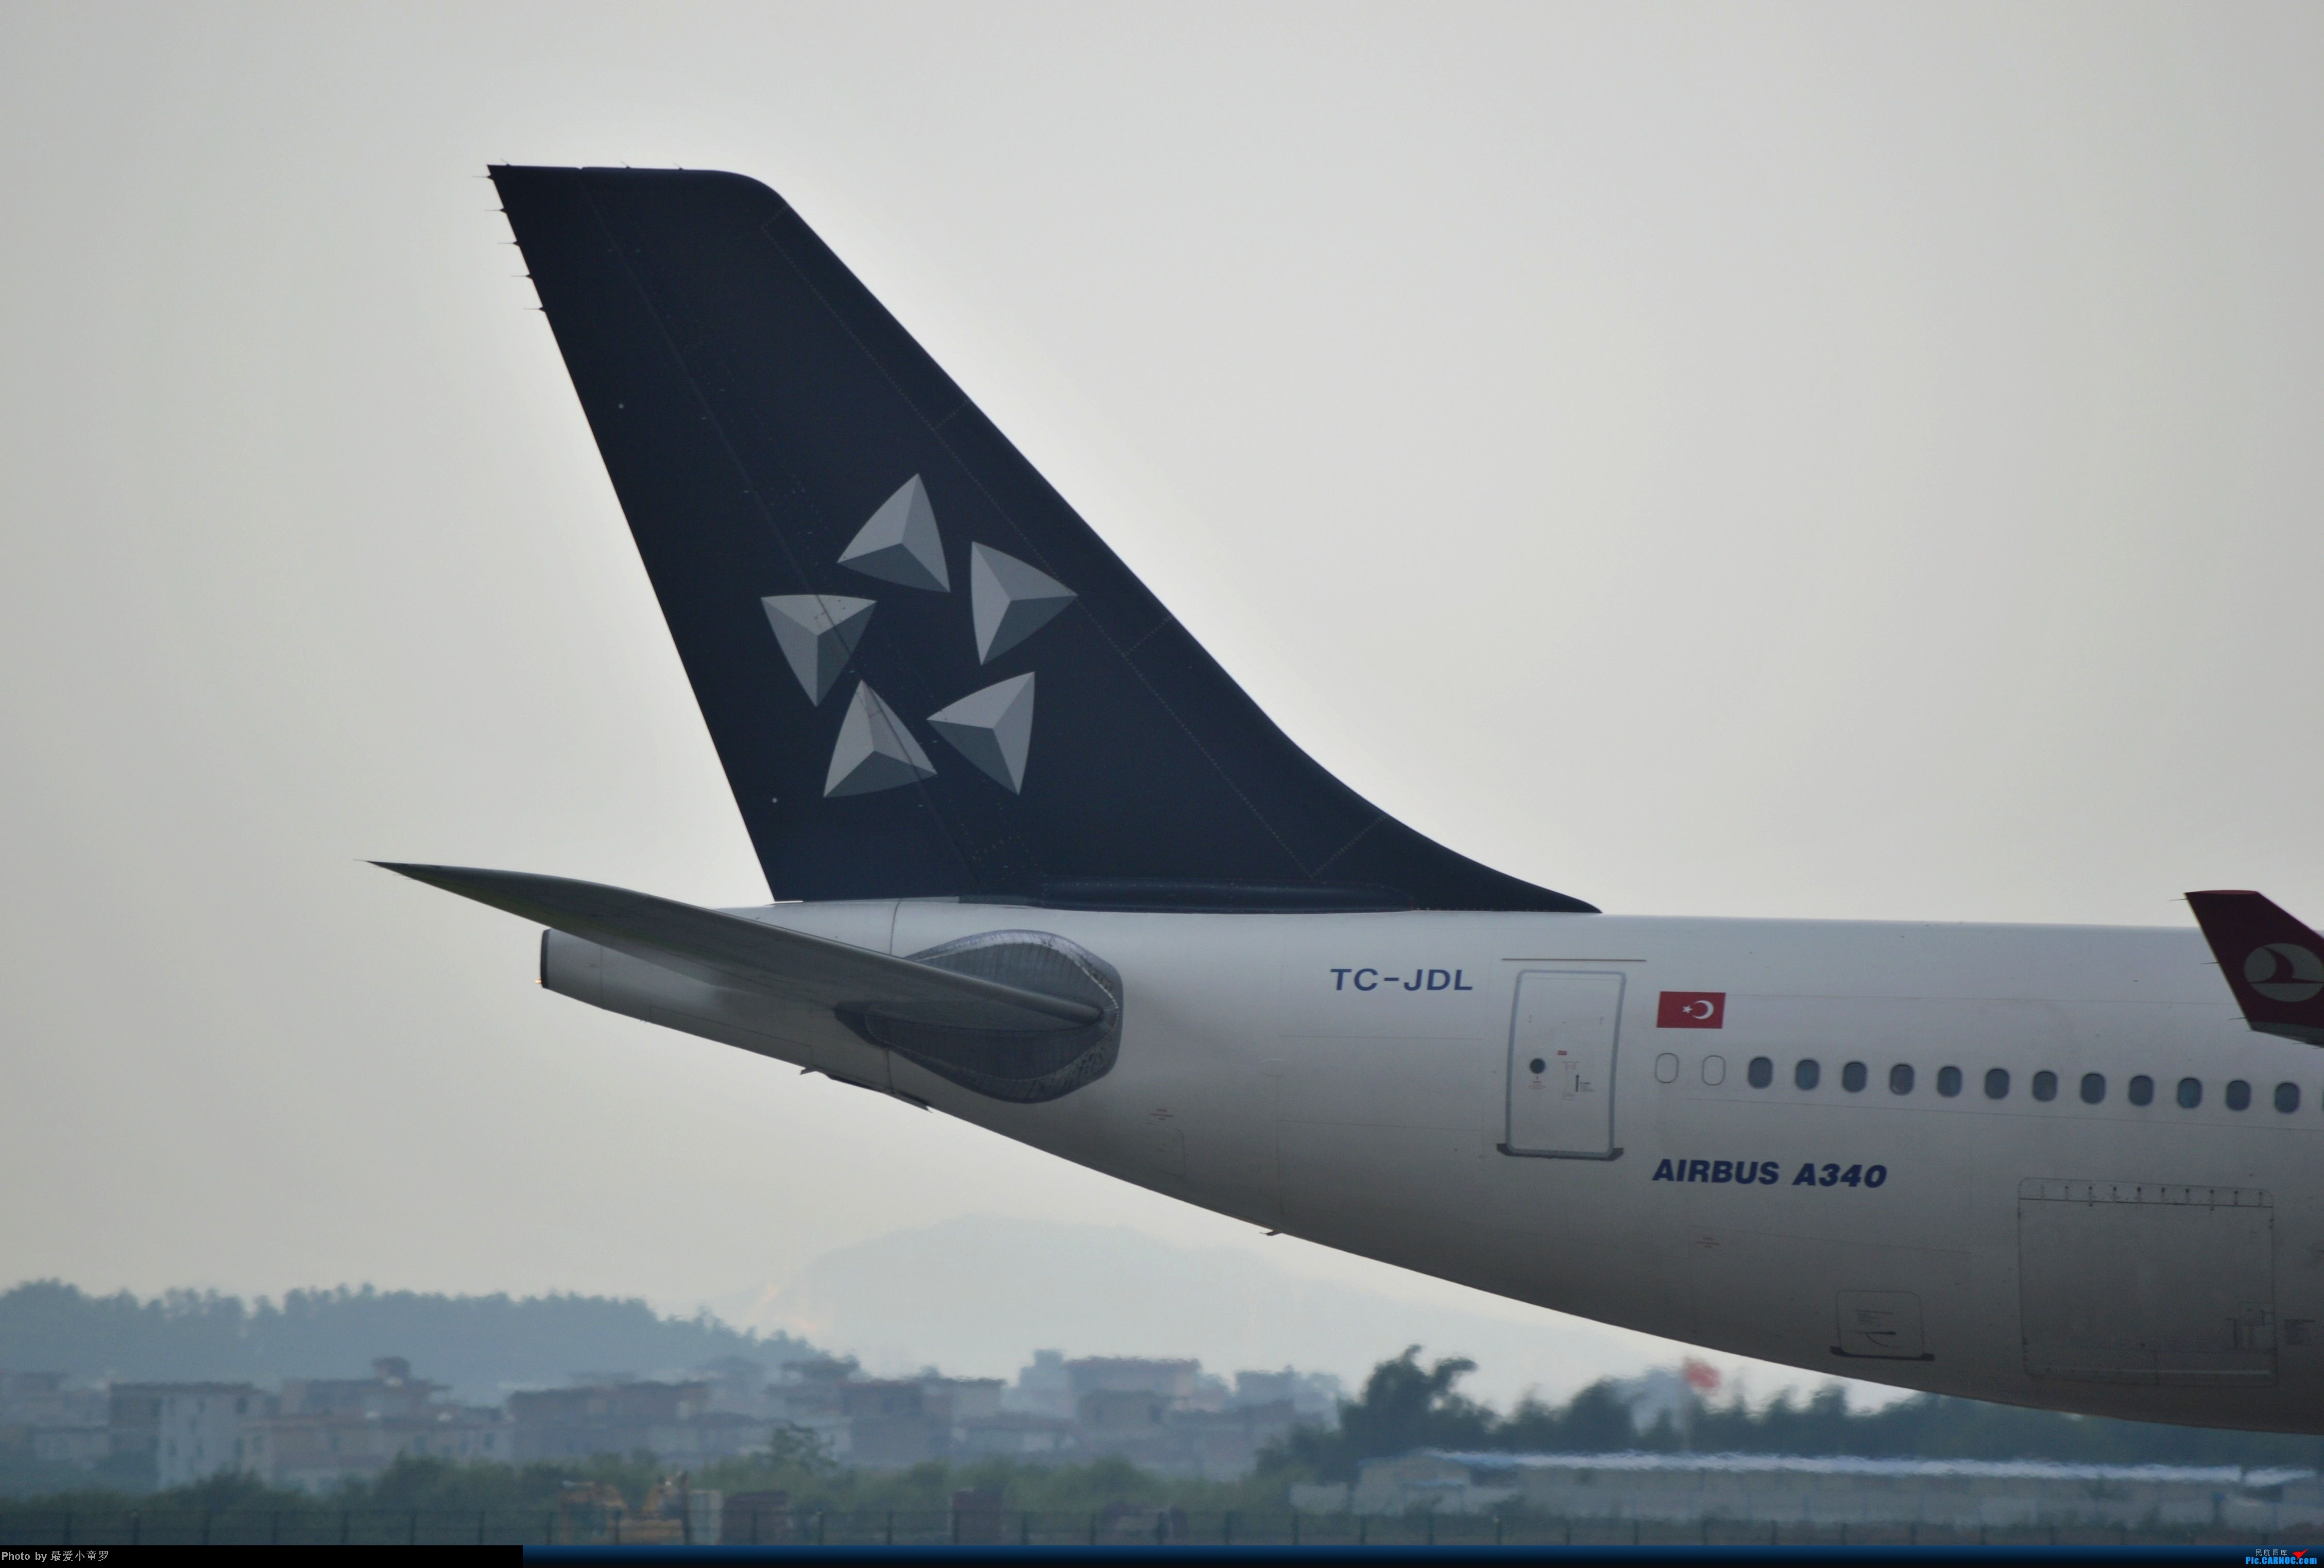 Re:[原创]CAN拍机杂图 AIRBUS A340-300 TC-JDL 中国广州白云机场